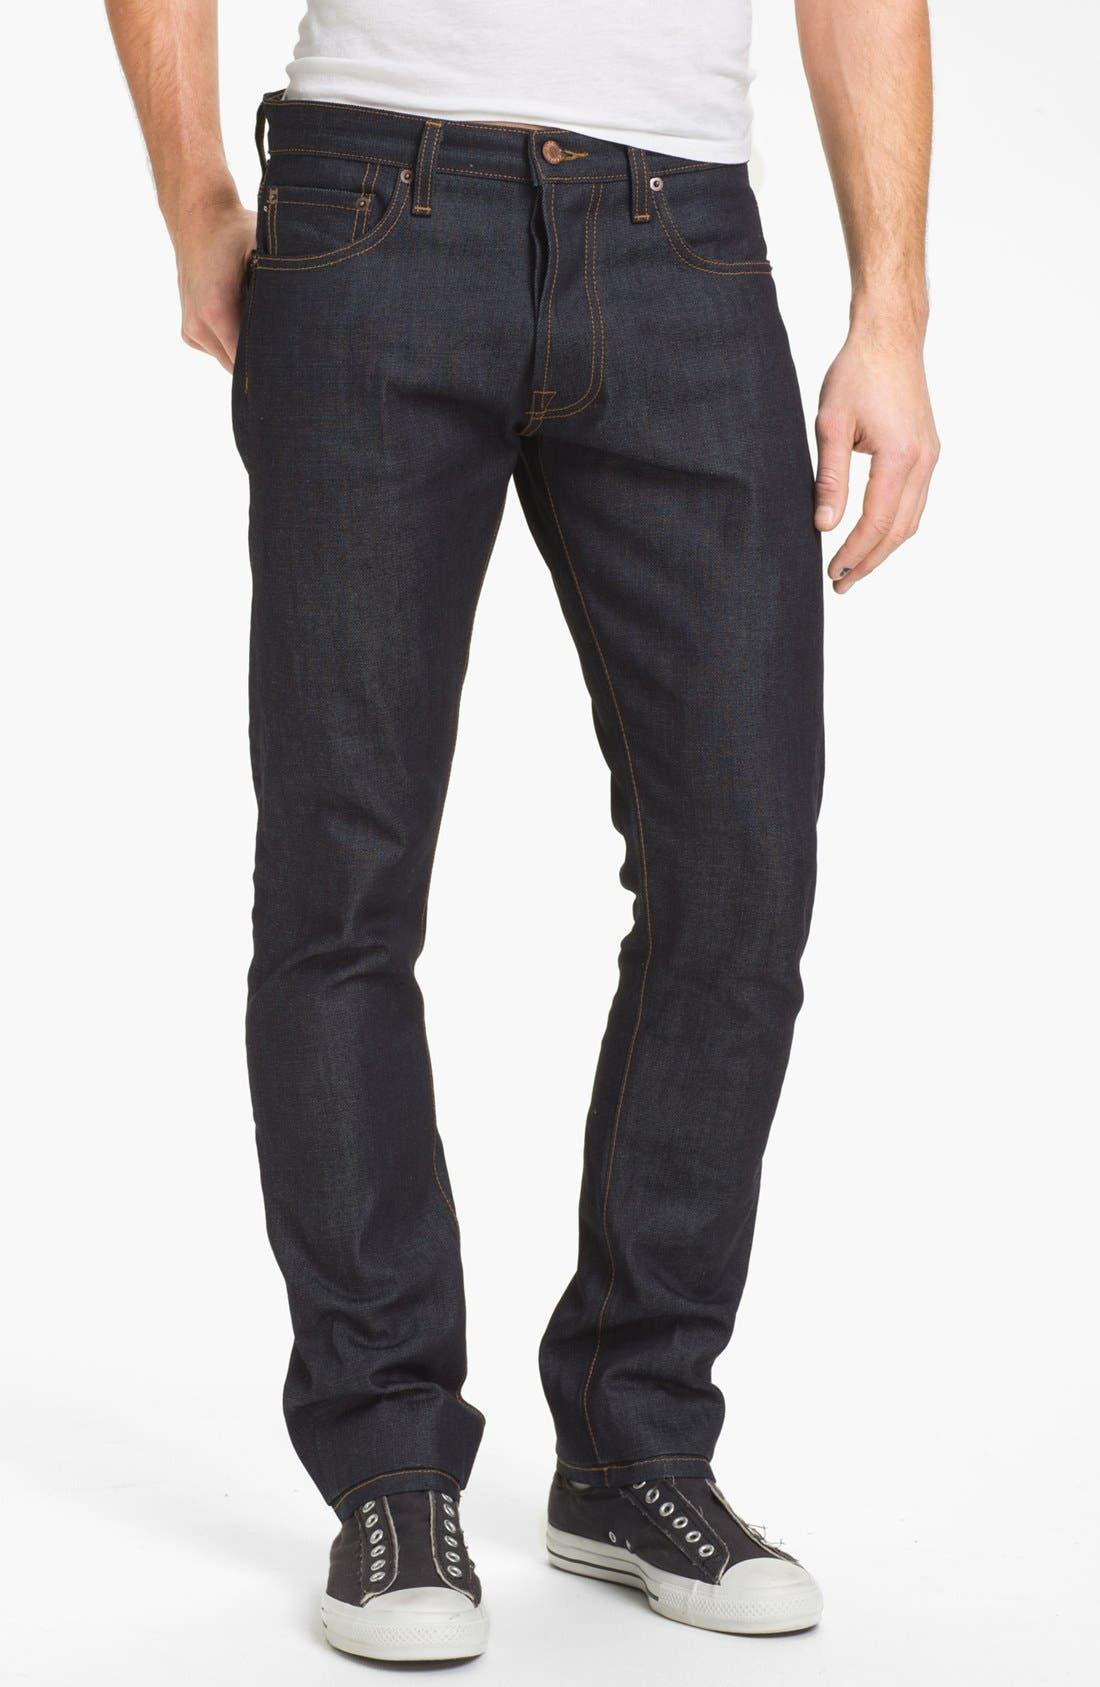 Alternate Image 1 Selected - Baldwin 'Henley' Slim Fit Selvedge Jeans (Dry)